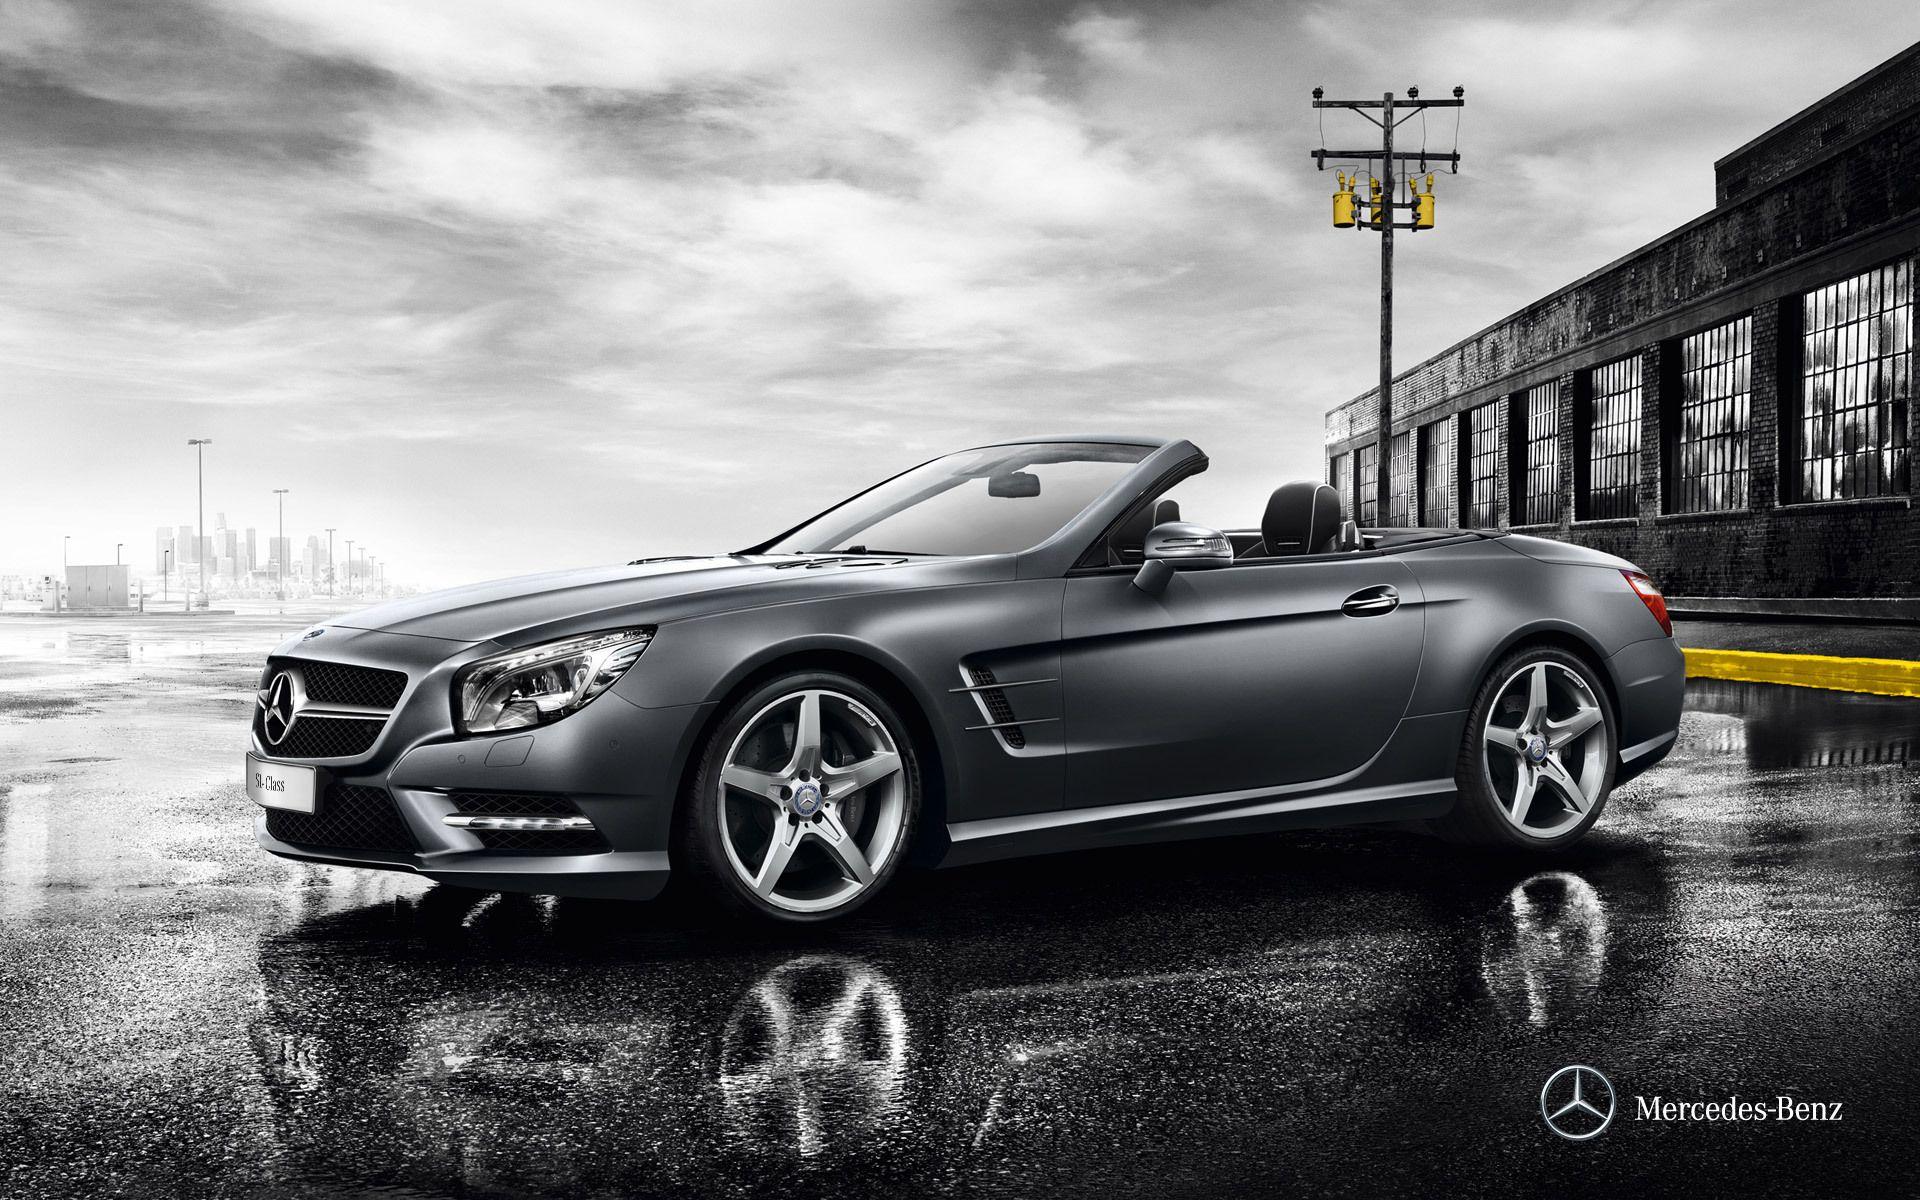 Pin By Meno Istorija On King Of Rep Mercedes Benz Cars Mercedes Benz Mercedes Sl